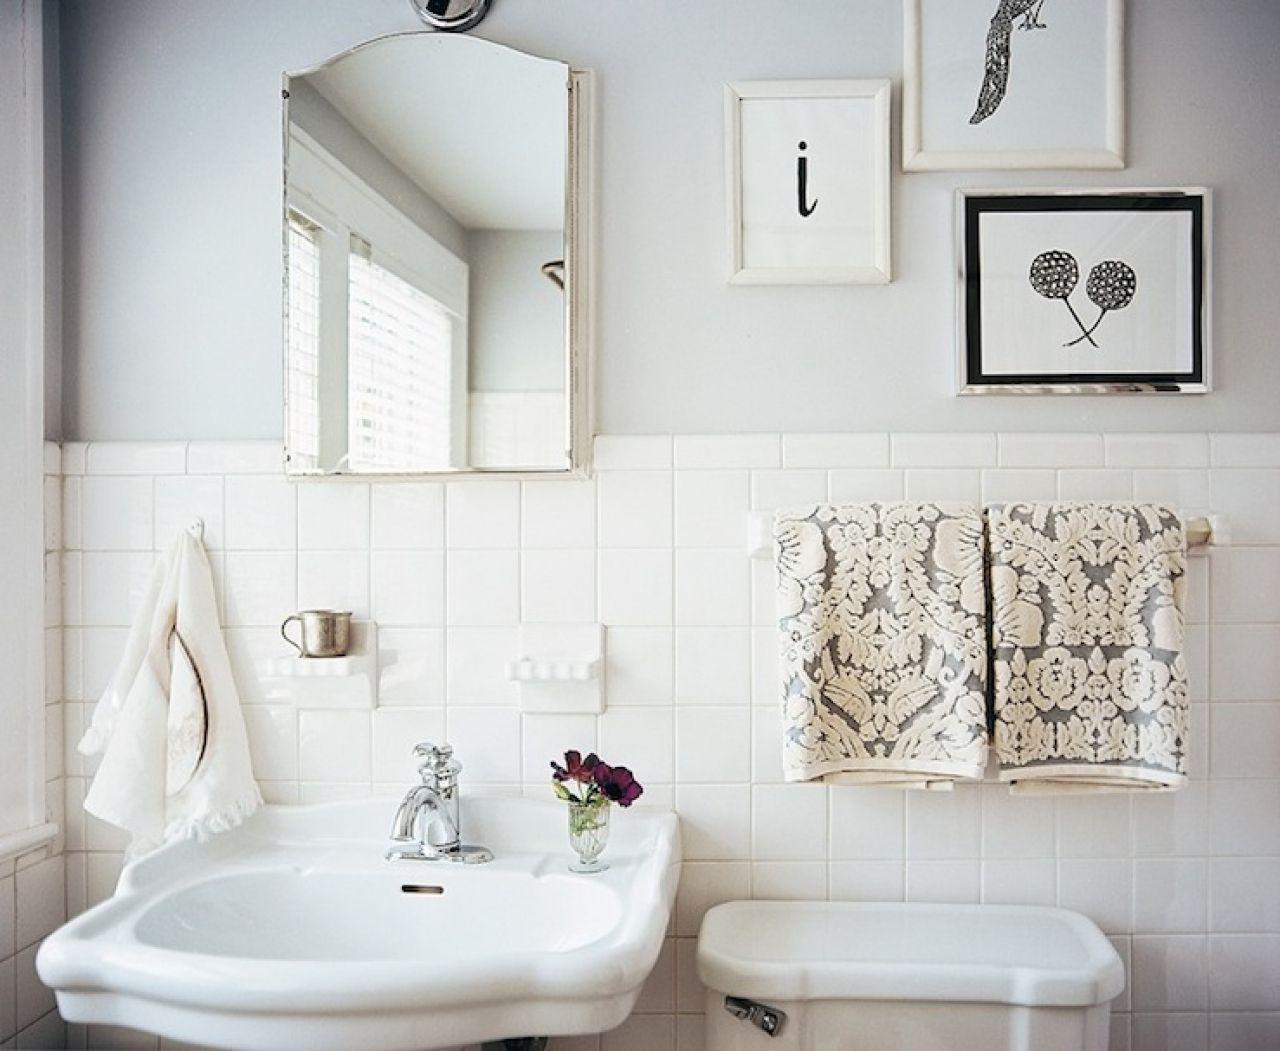 Retro Bathroom Design Ideas | Source angie hranowski beautiful ...